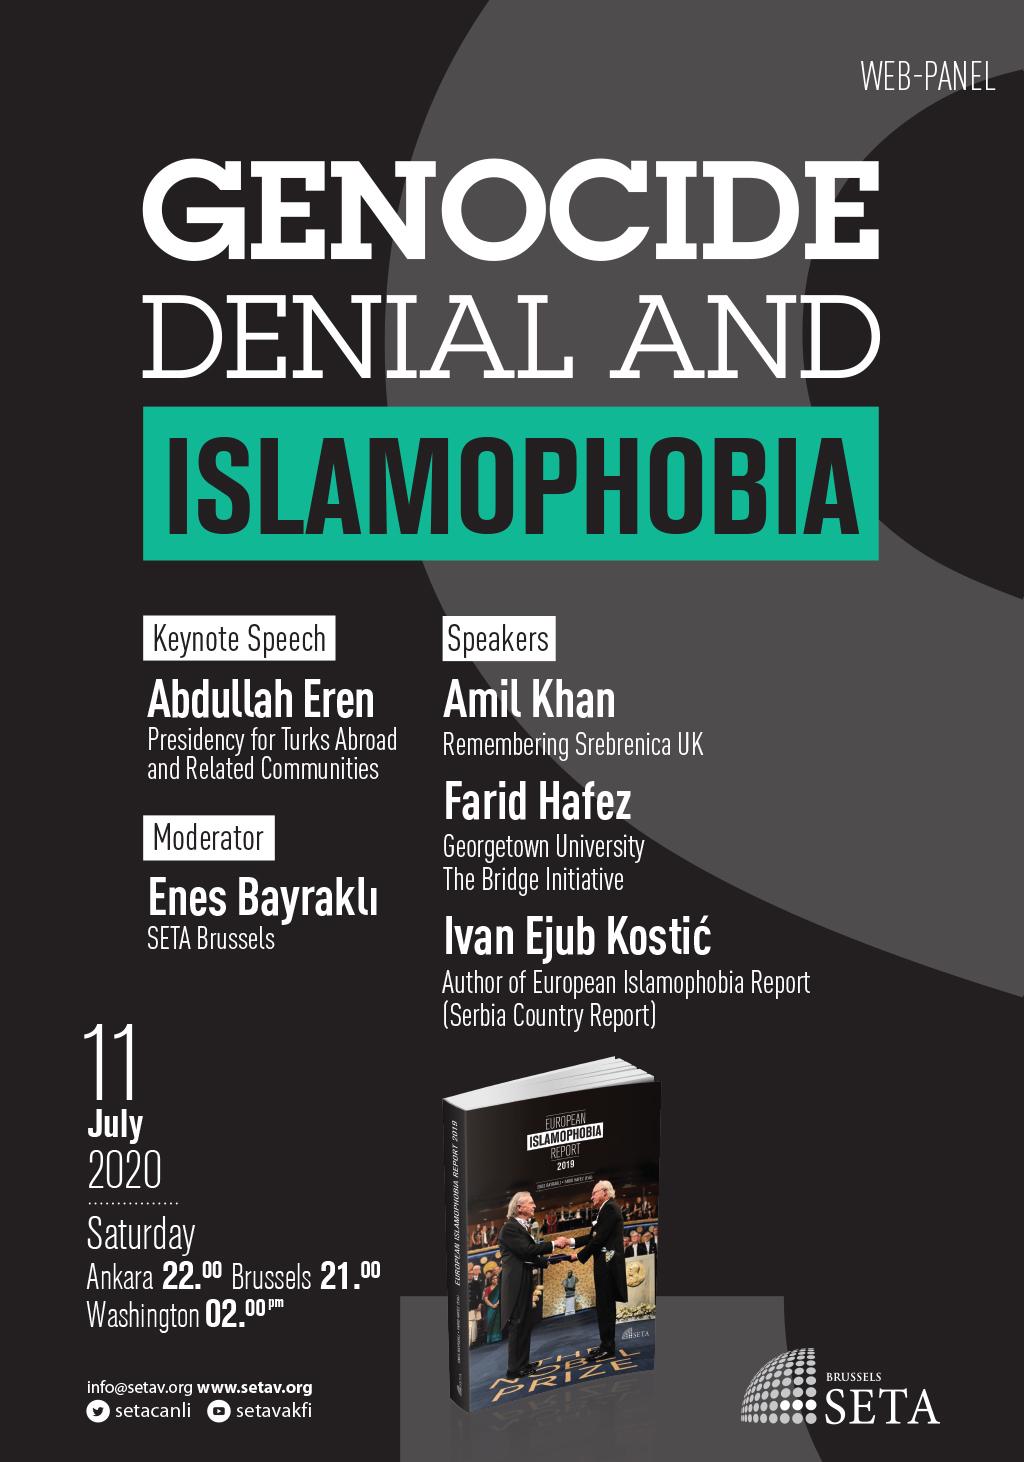 Web Panel: Genocide Denial and Islamophobia